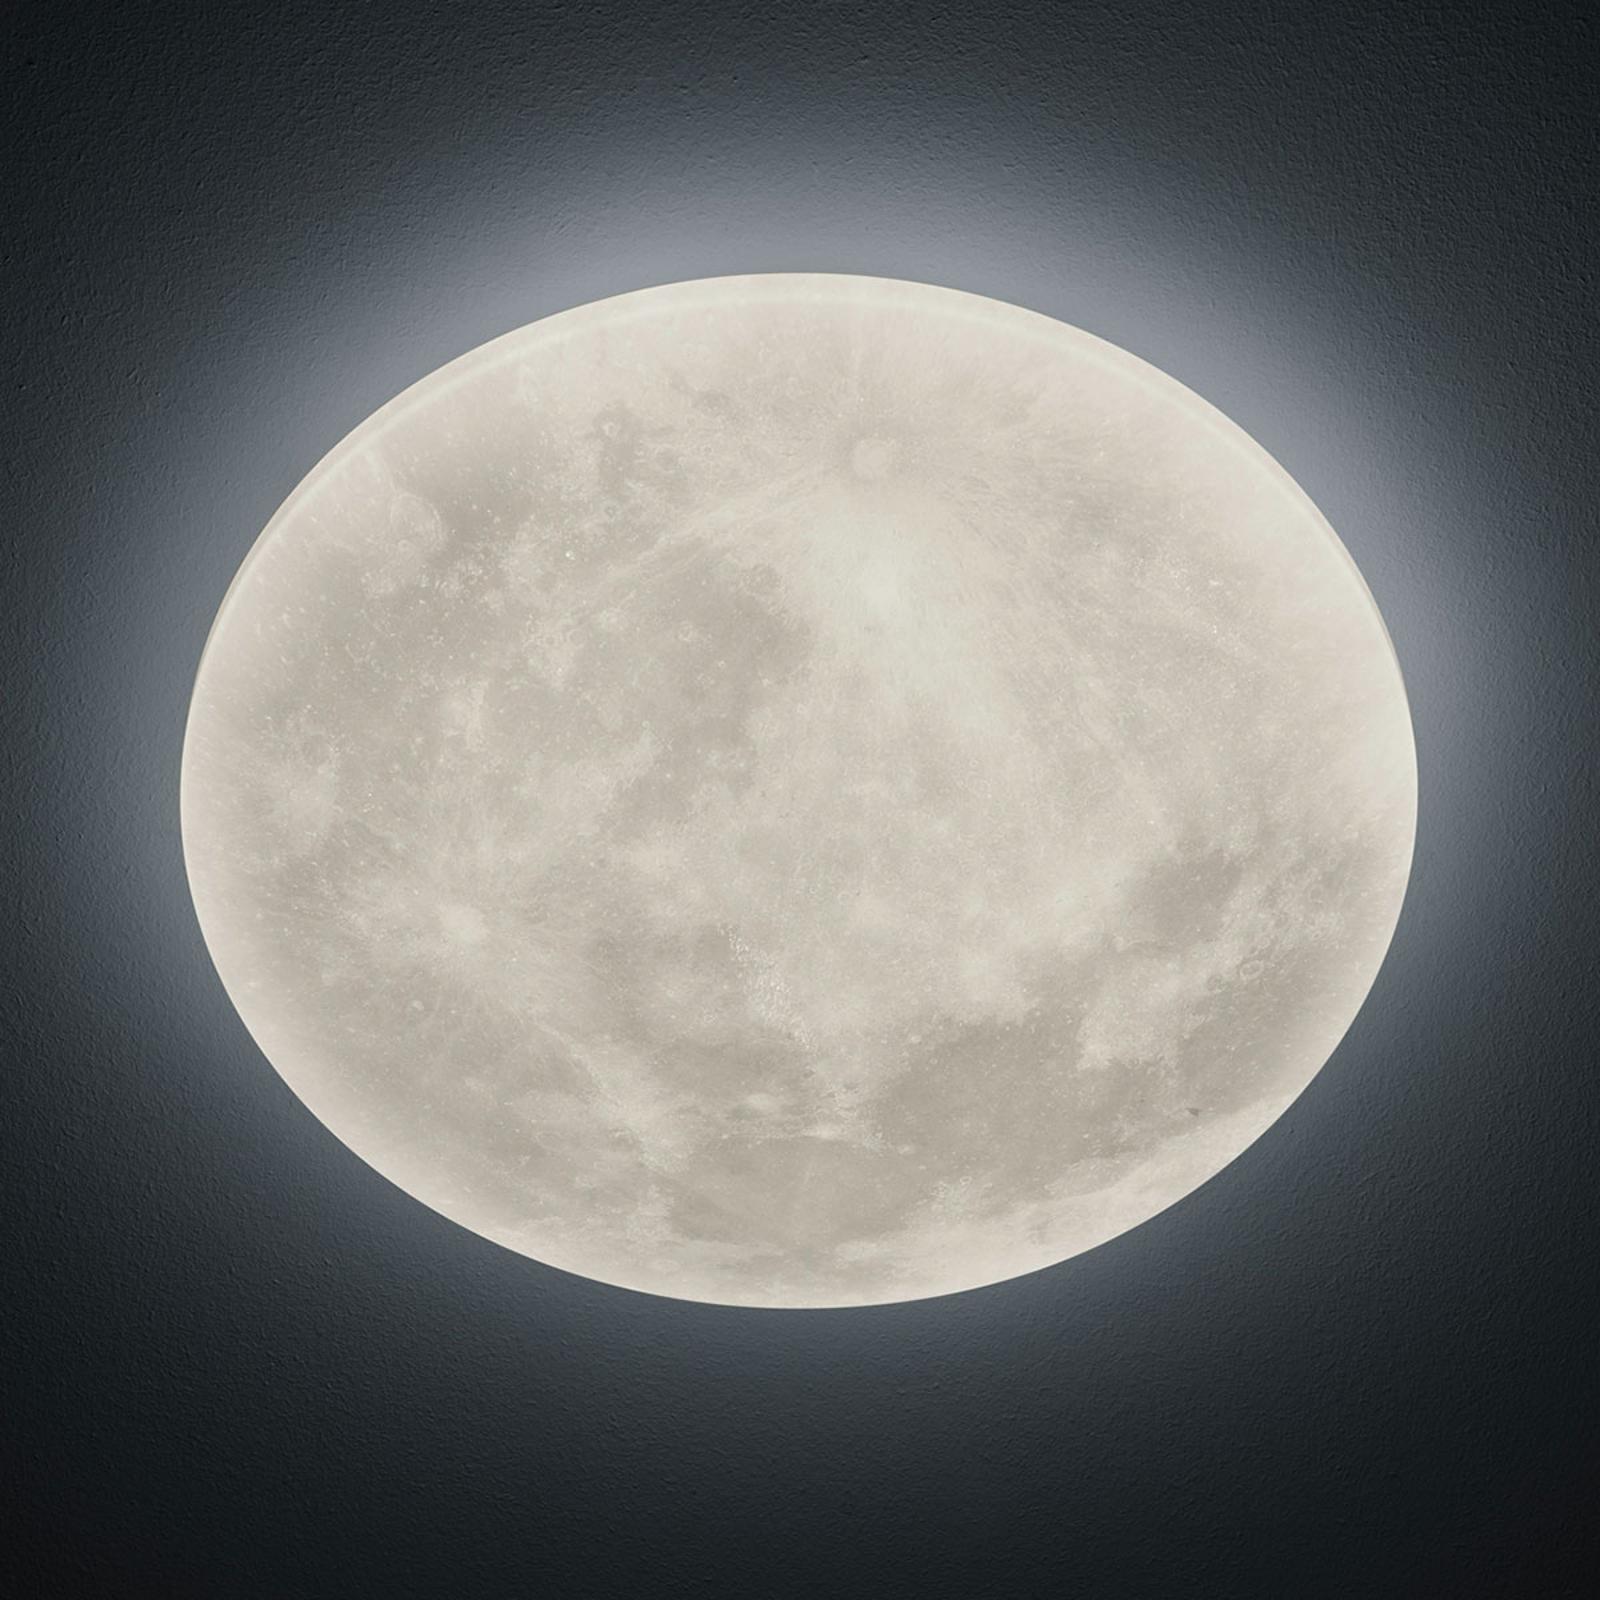 Lampa sufitowa LED Lunar, pilot, 40cm